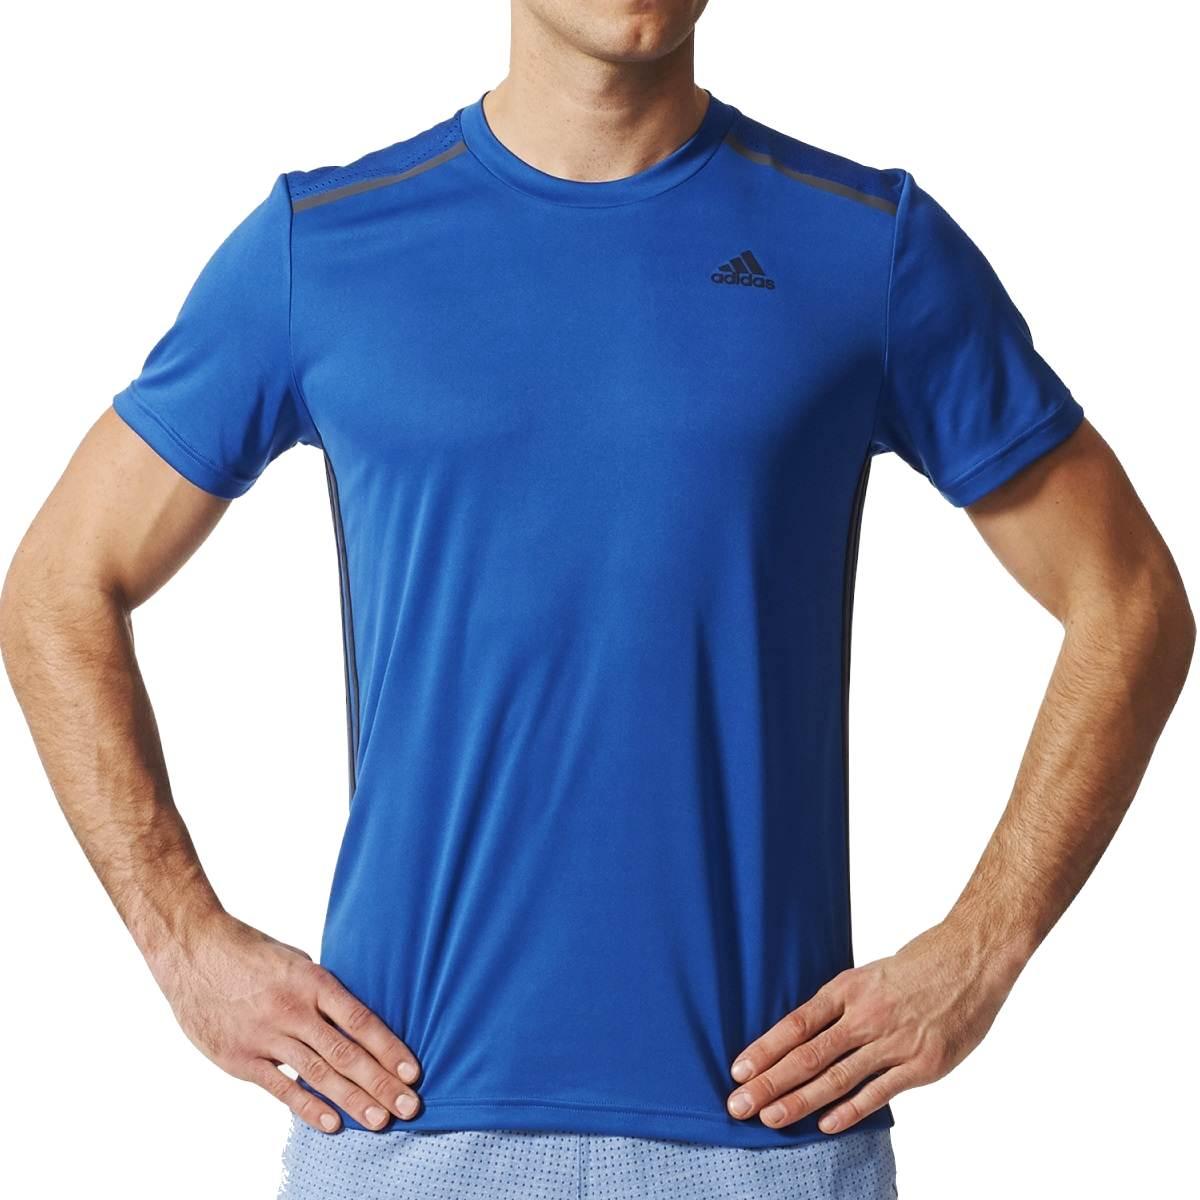 adidas cool 365 t shirt sportshirt laufshirt fitness jogging herren ebay. Black Bedroom Furniture Sets. Home Design Ideas